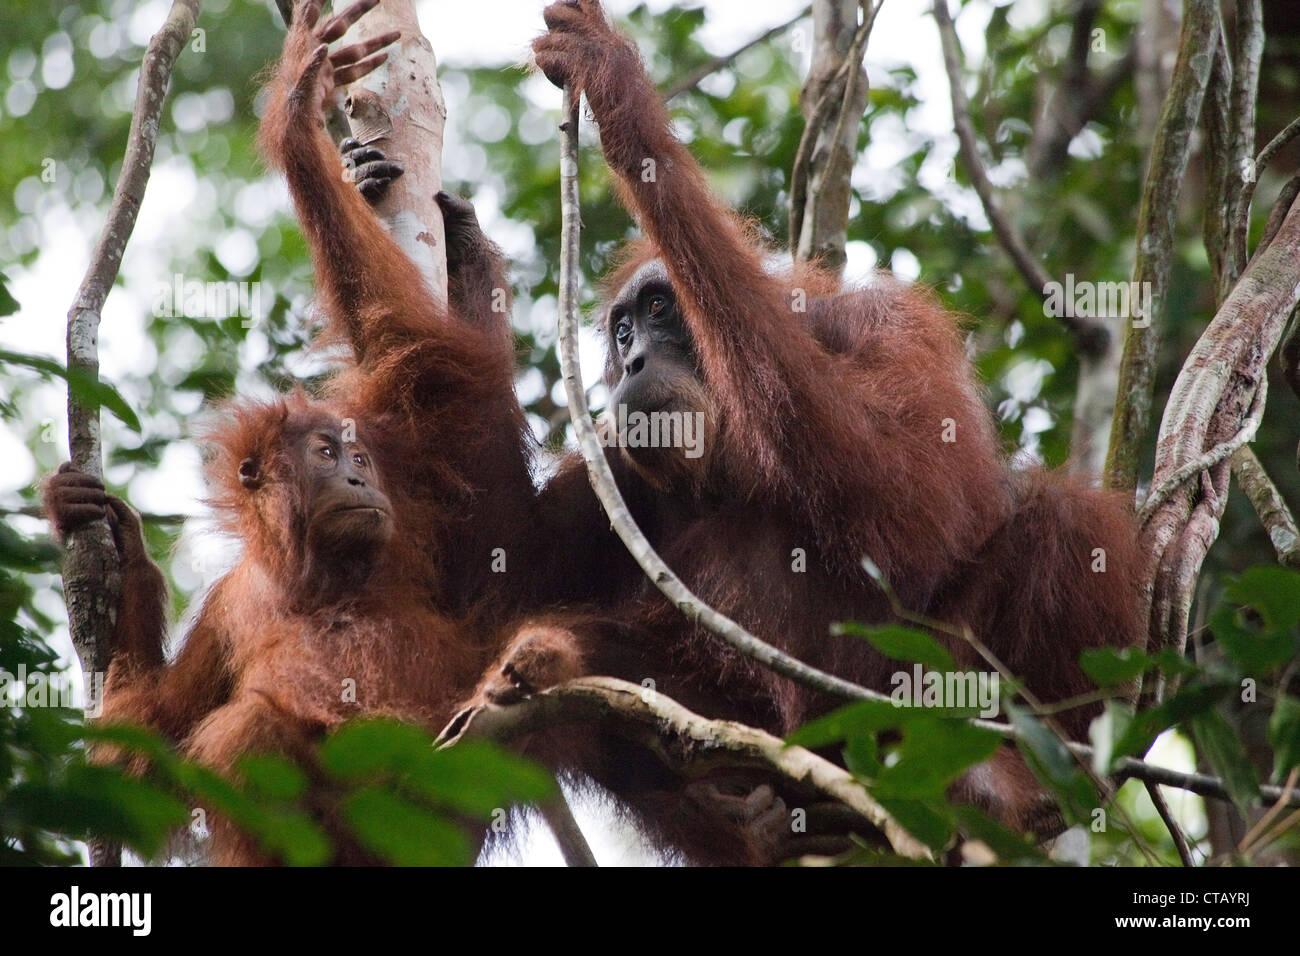 Orang Utans at the Gunung Leuser National Park near Bukit Lawang, Island of Sumatra, Indonesia, Southeast Asia Stock Photo